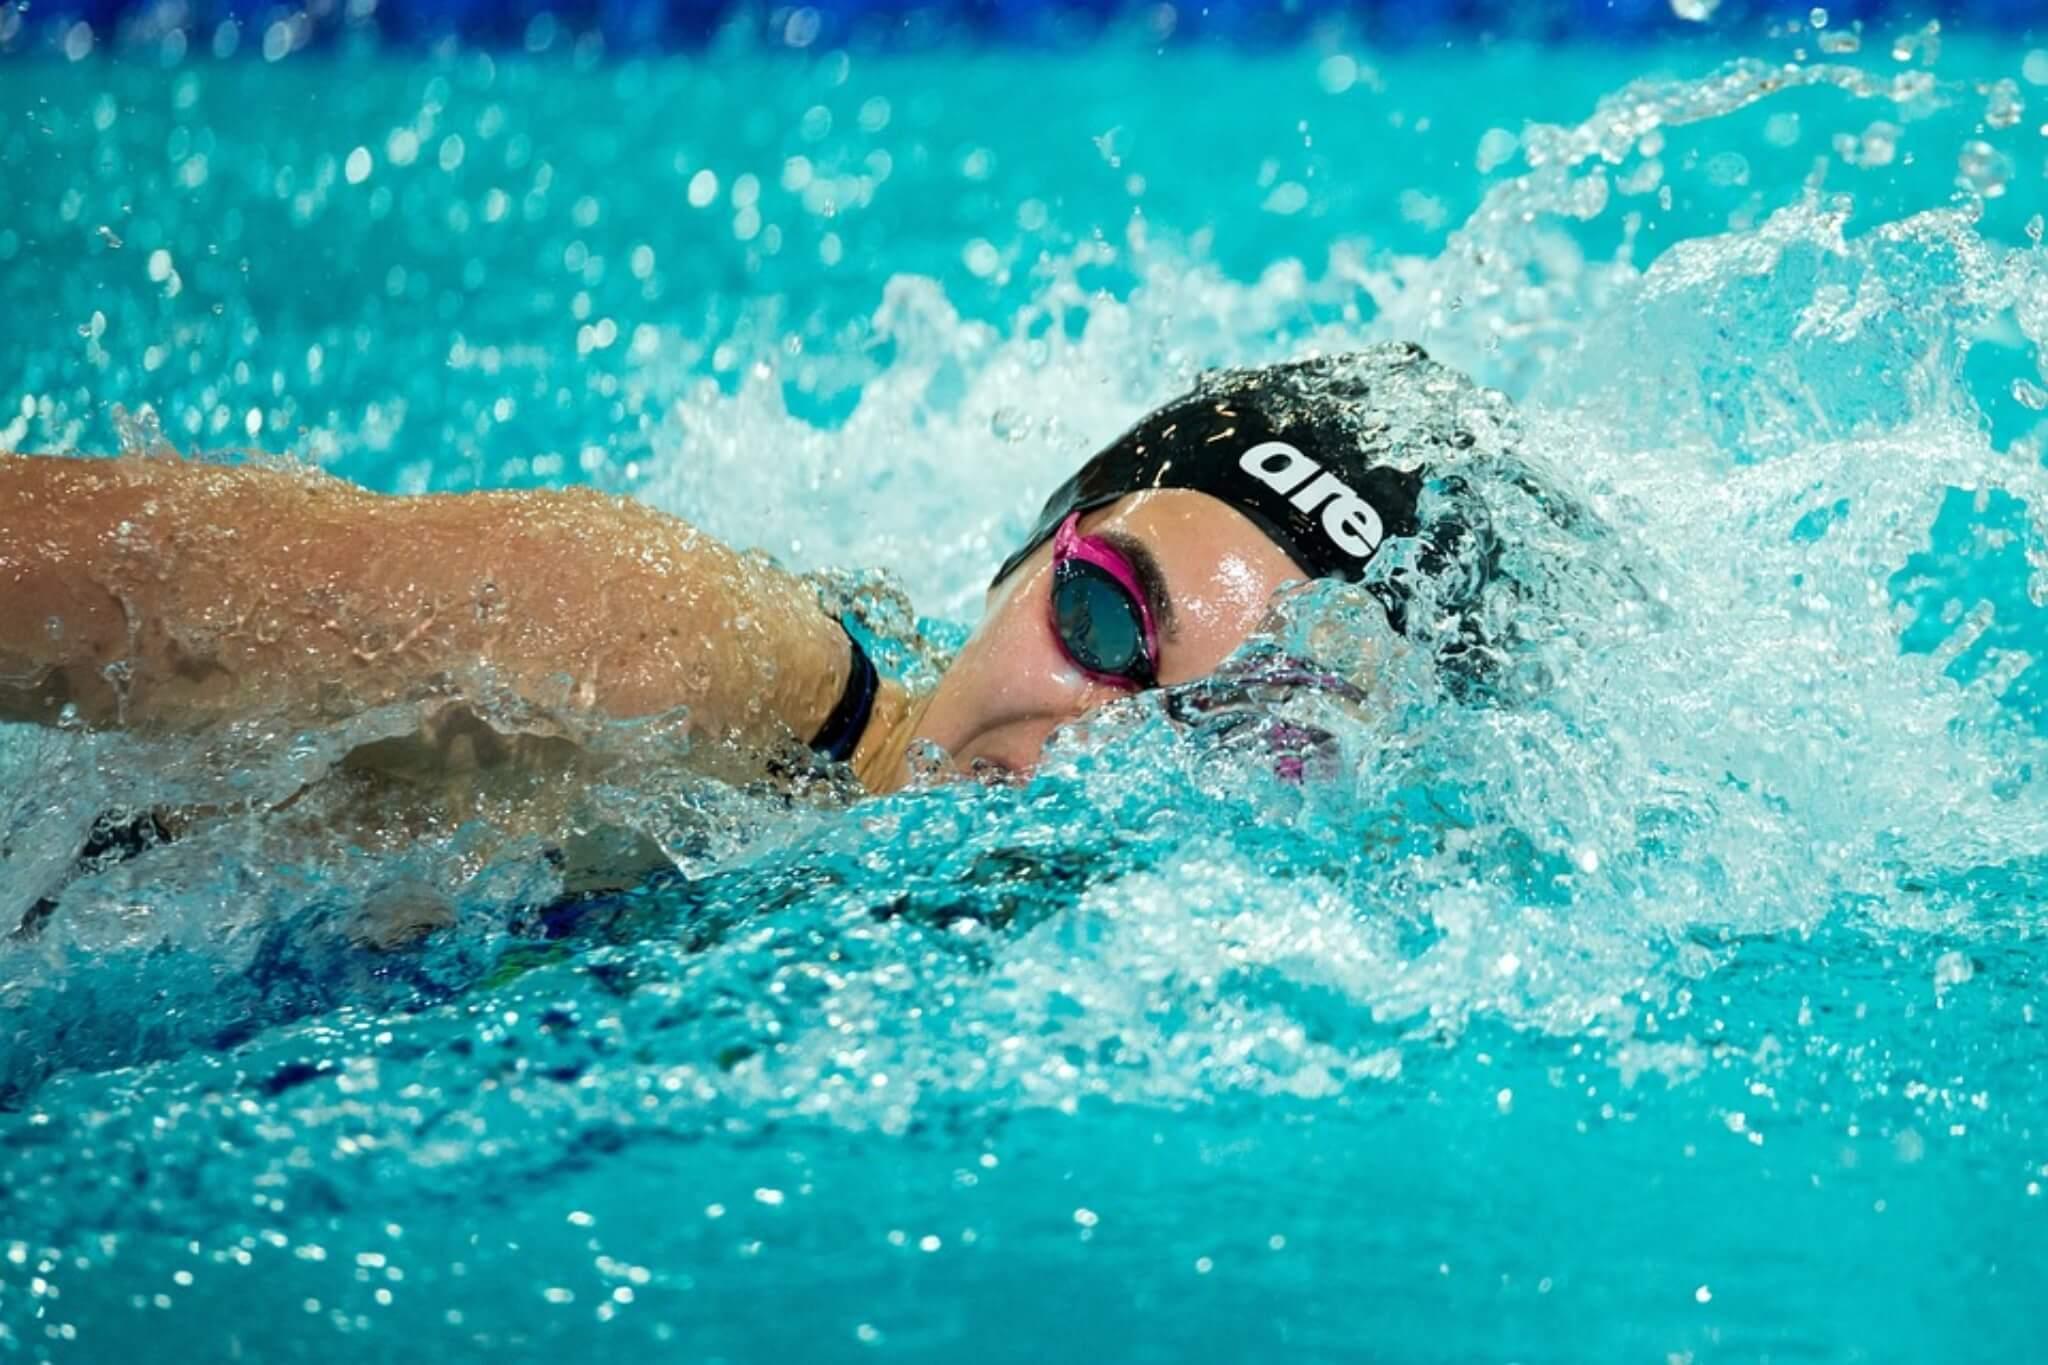 nuoto, benefici e falsi miti